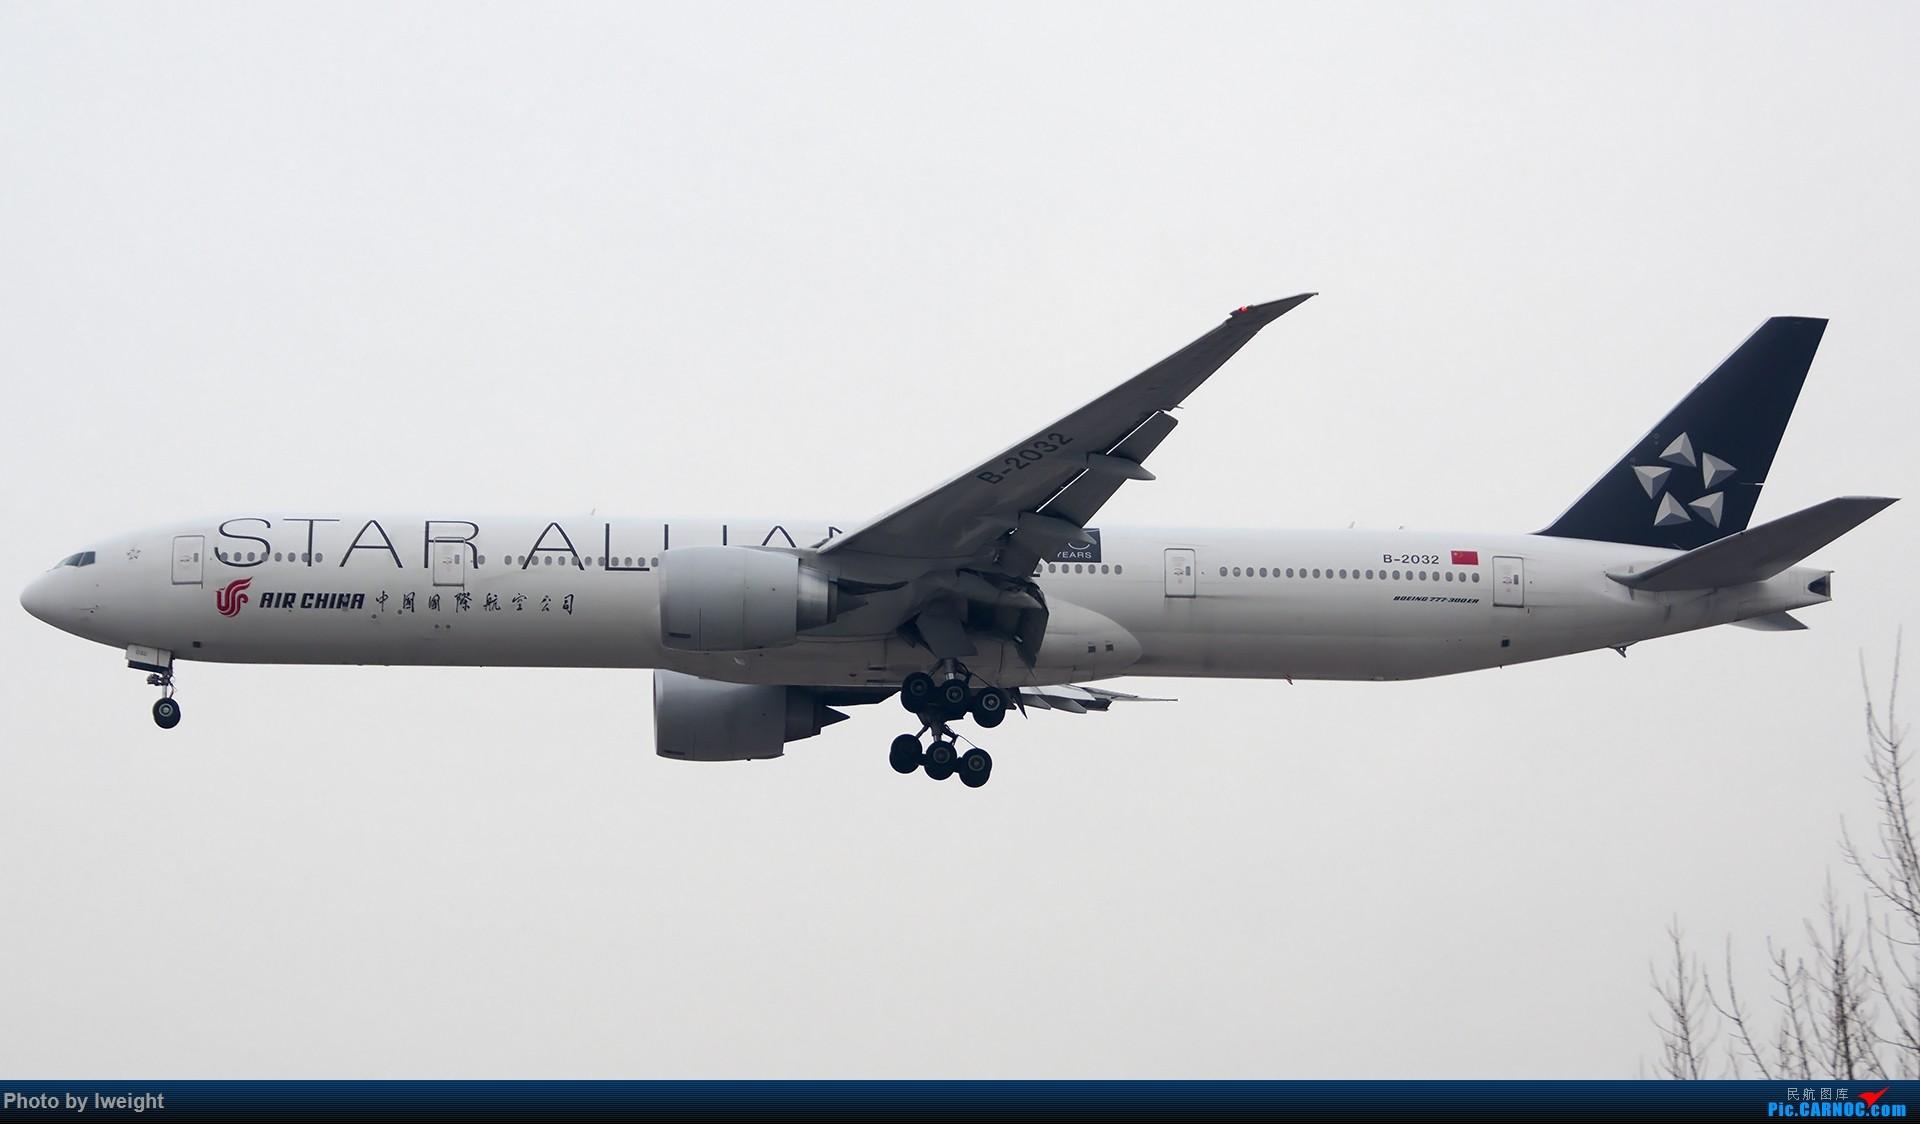 Re:[原创]2014-12-06 PEK天气由好变坏的直接体验 BOEING 777-300ER B-2032 中国北京首都国际机场